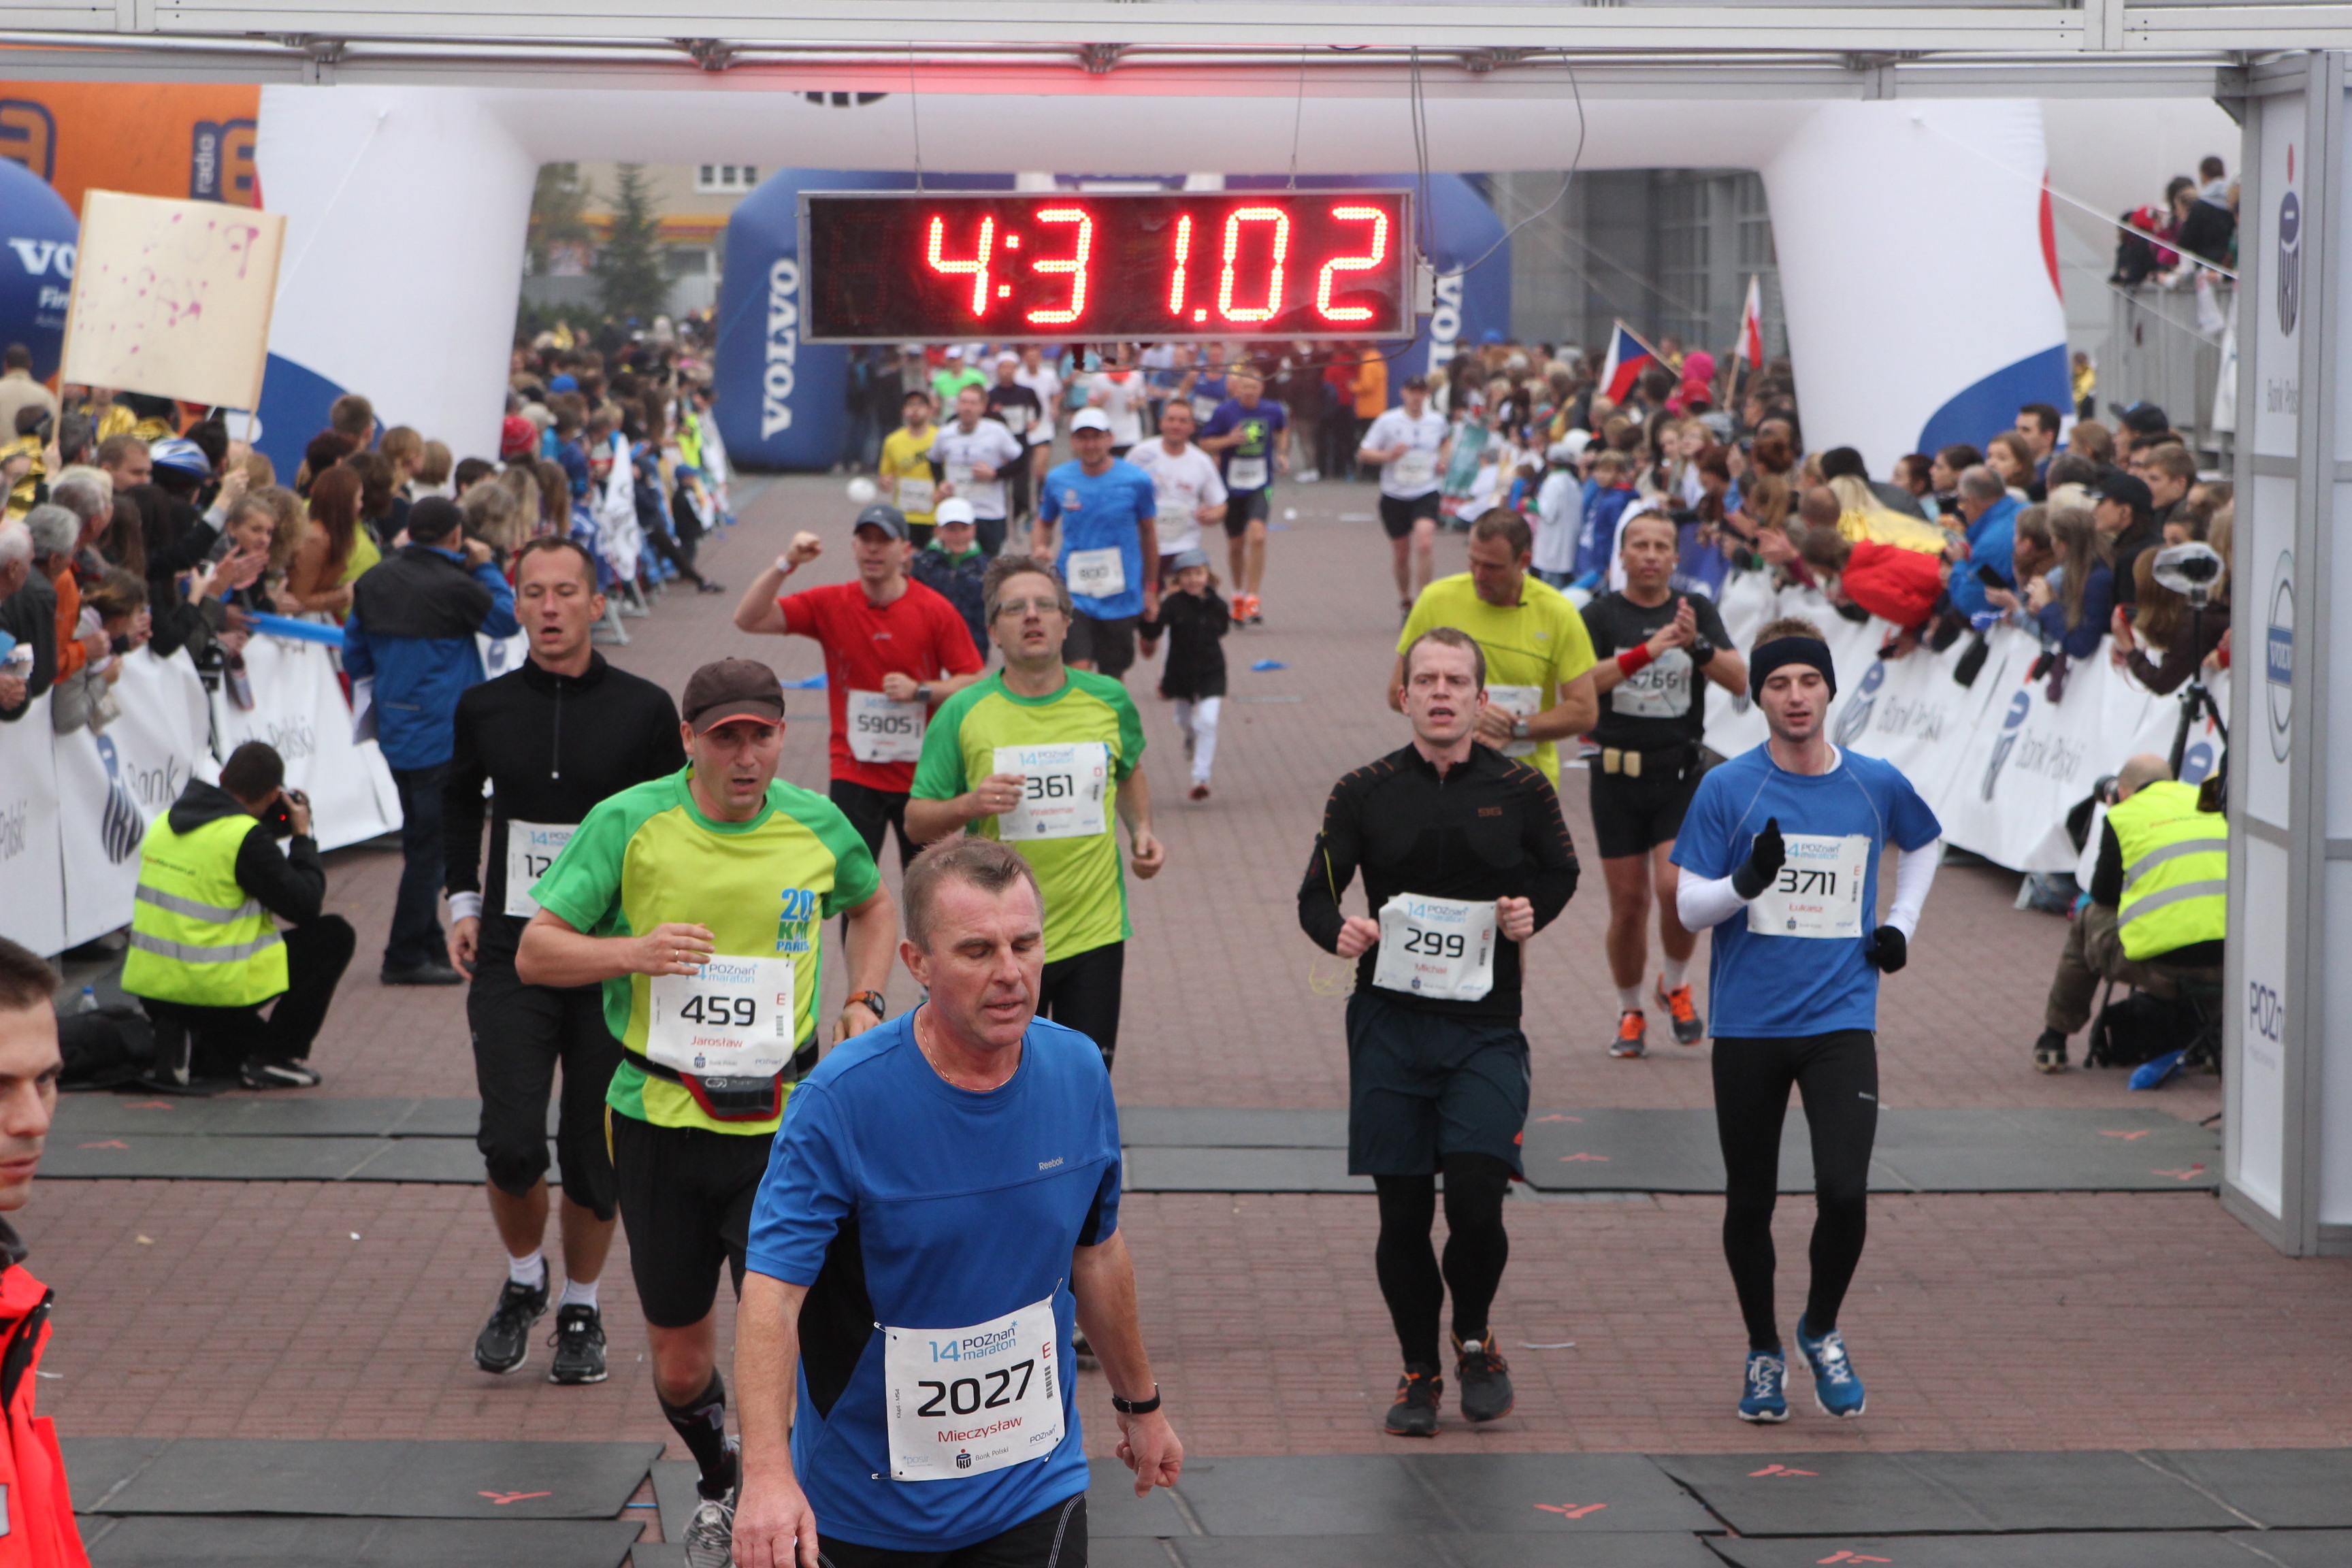 Poznan-maraton-2013-finisz.jpg